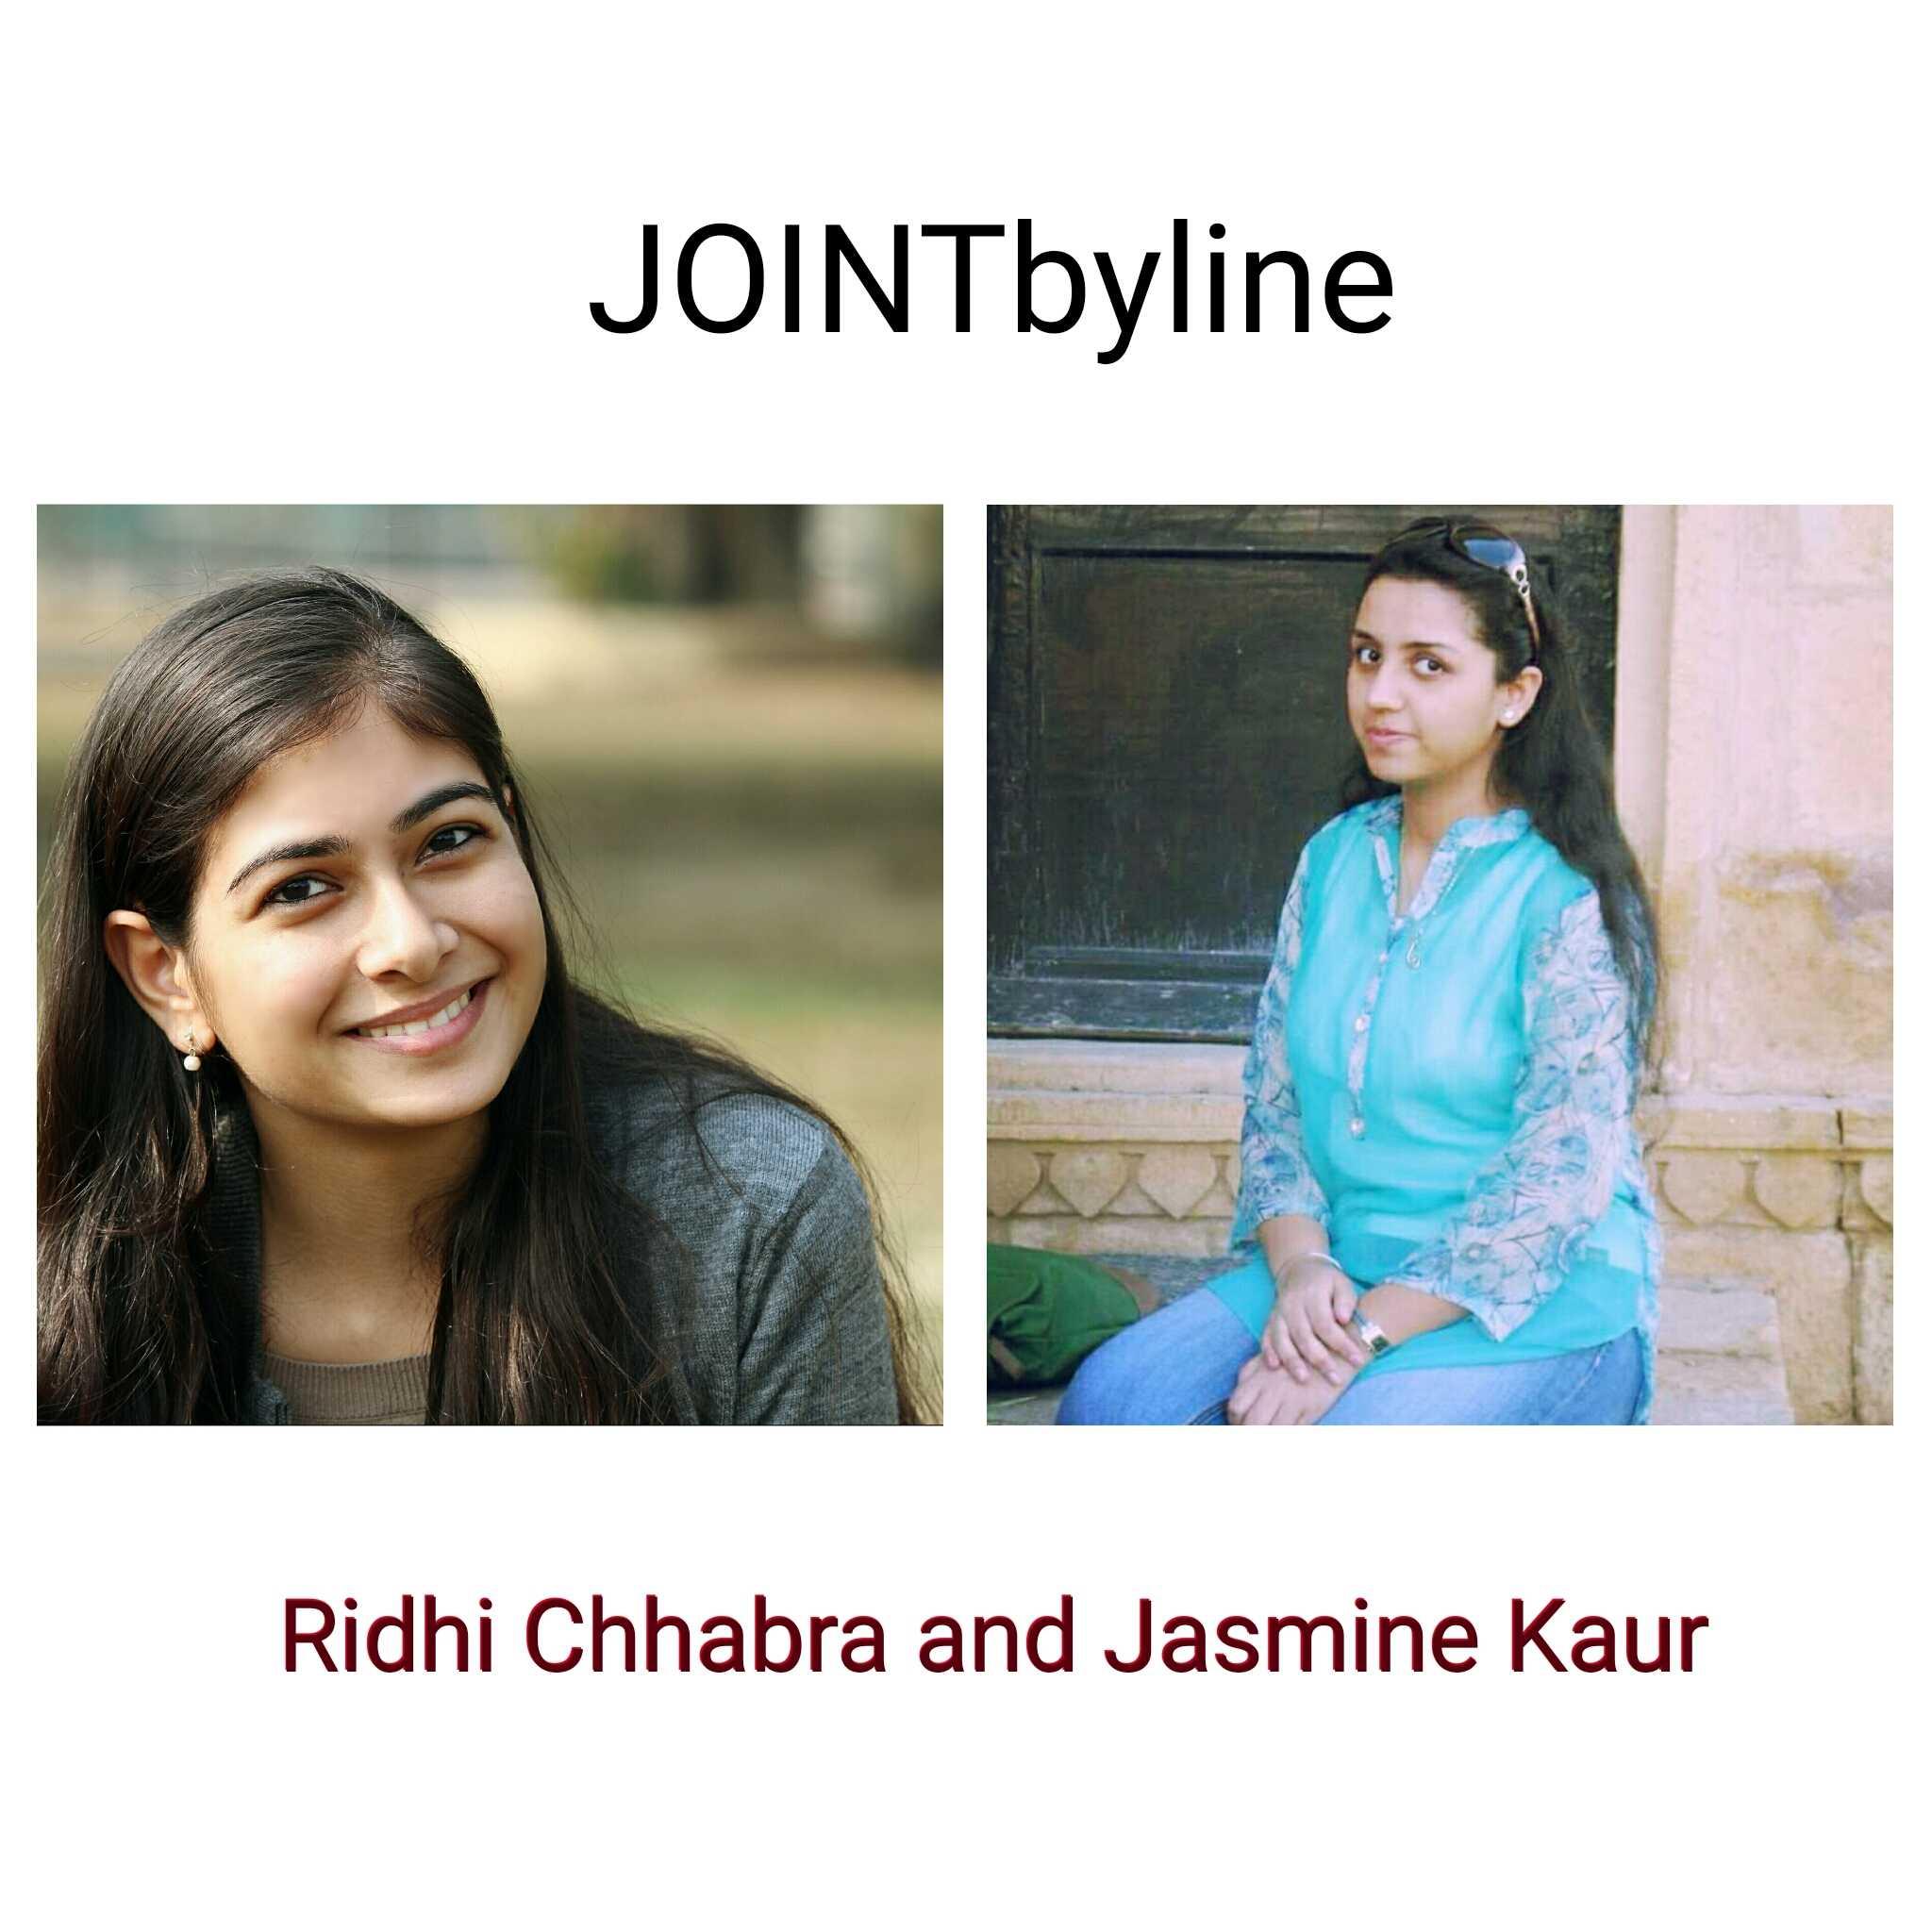 Ridhi Chhabra and Jasmine Kaur-fnbworld